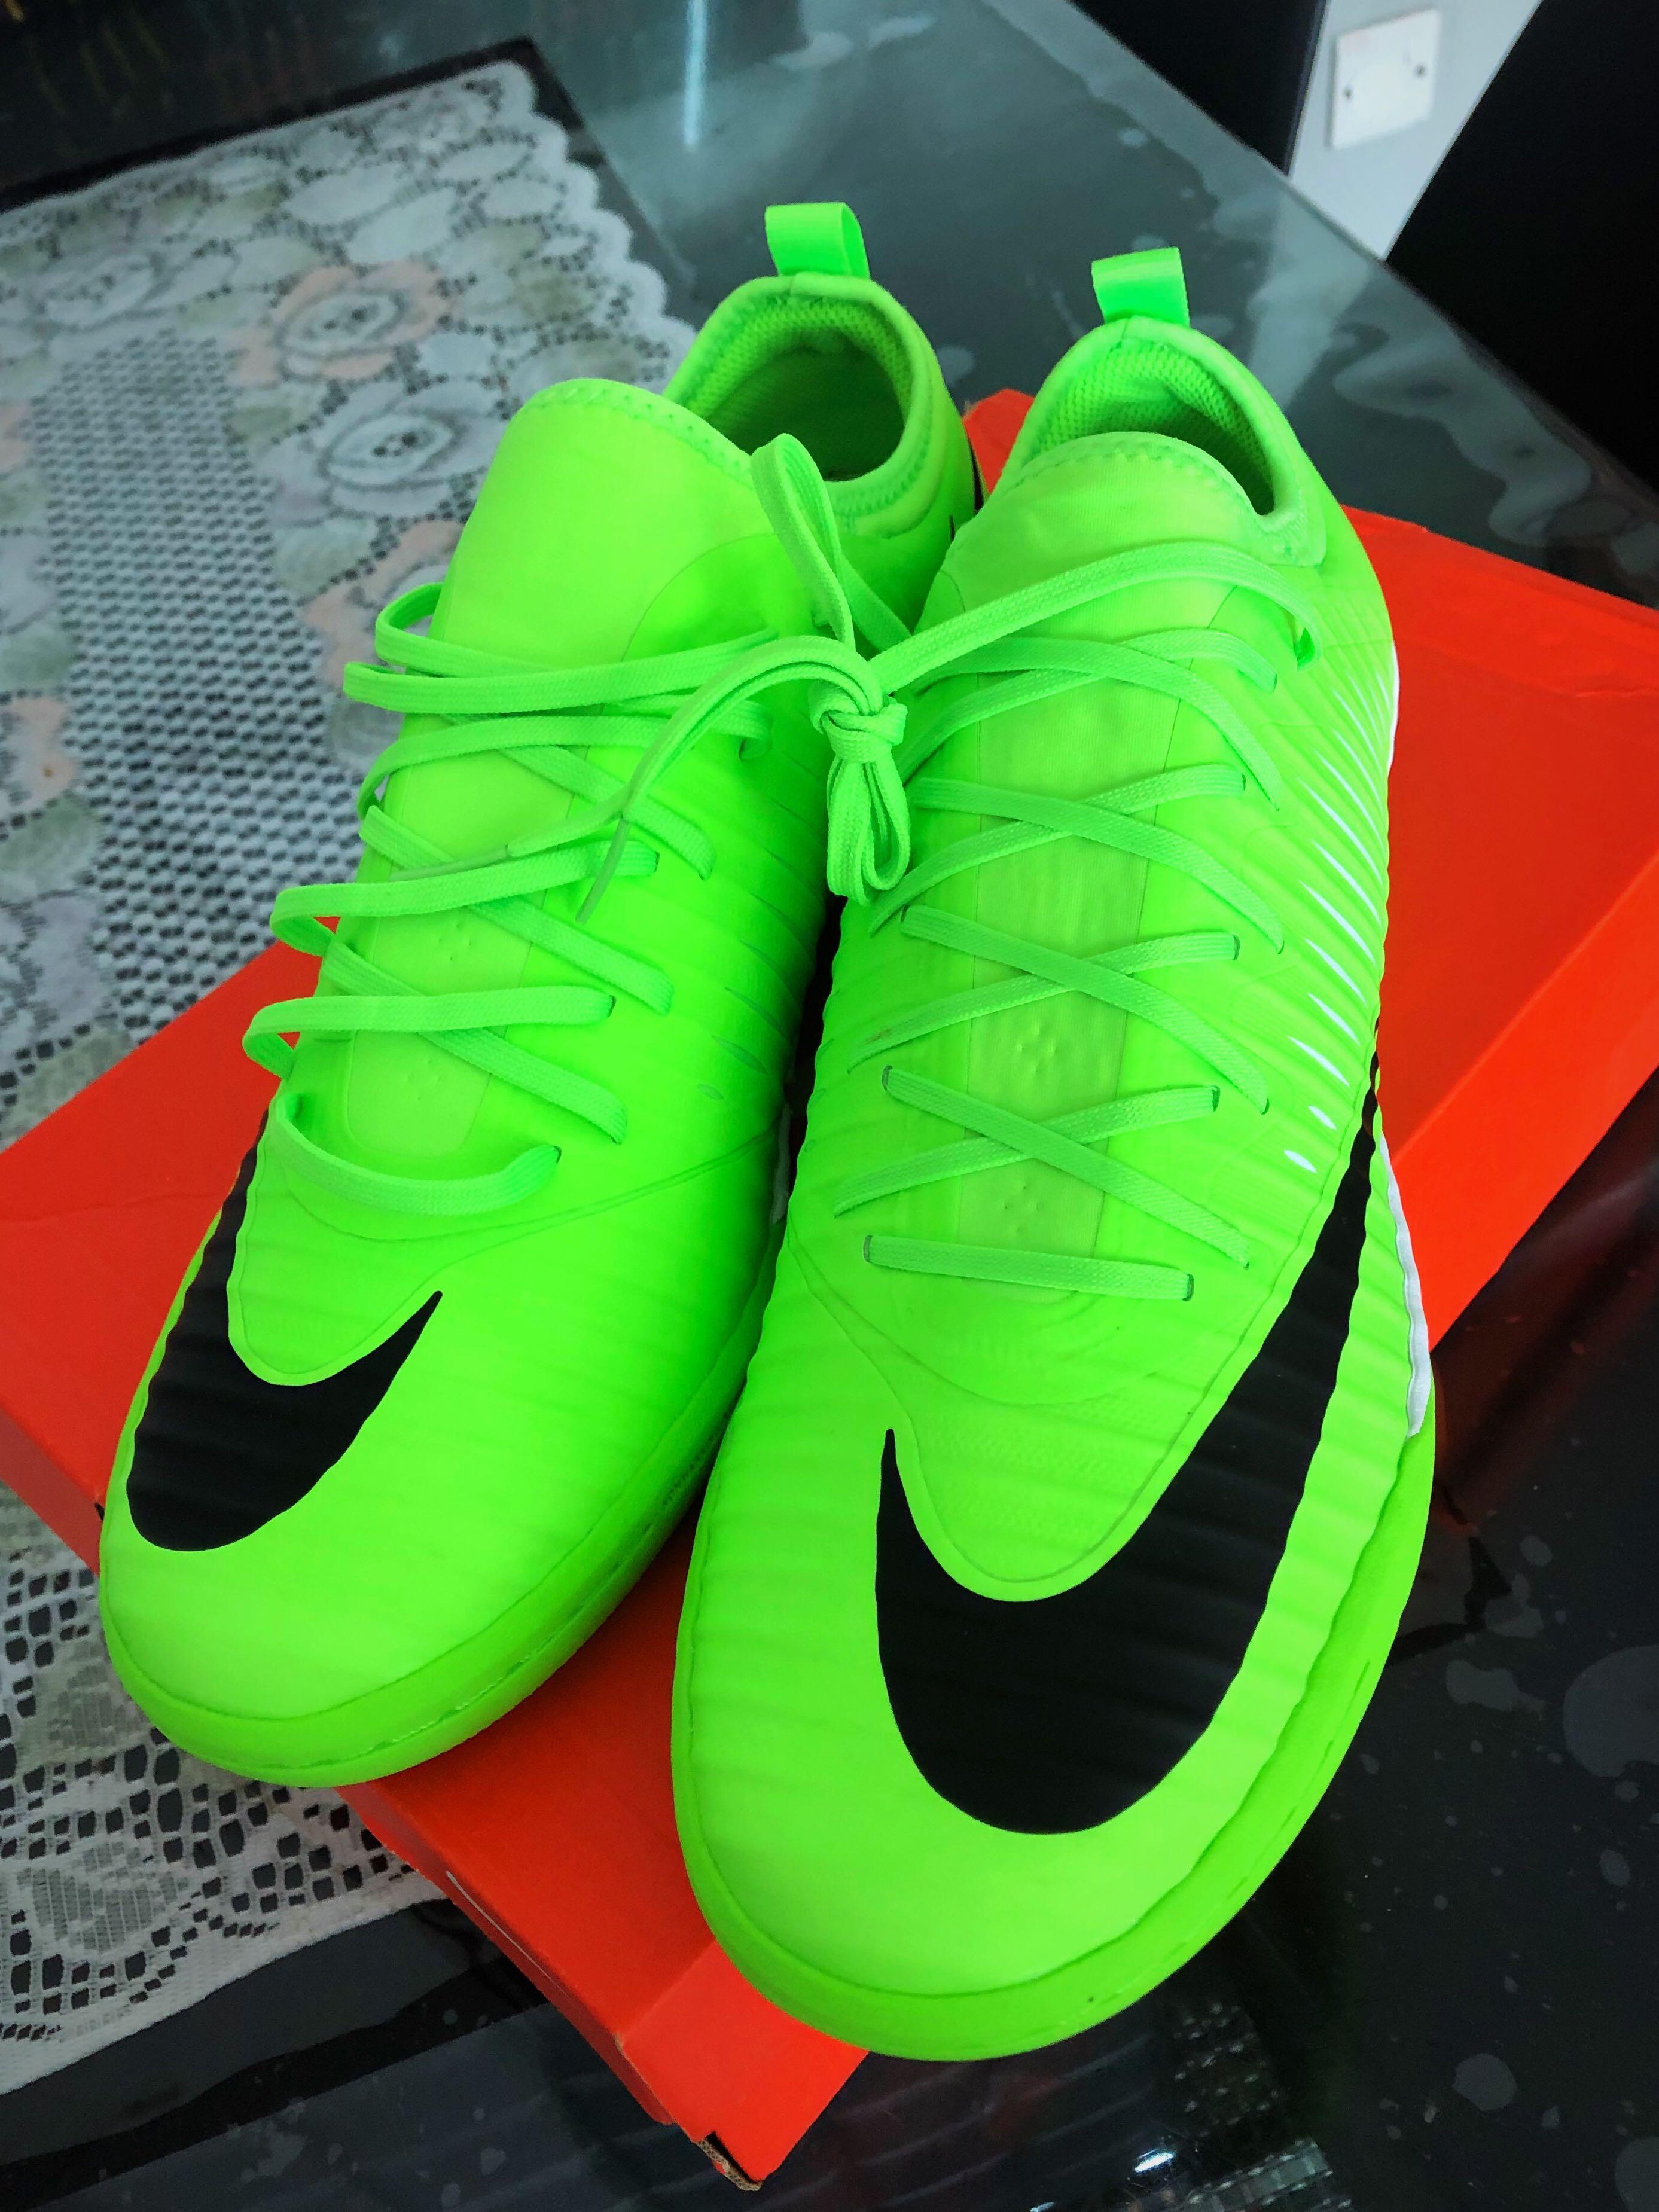 Brand new Nike Mercurial Soccer Sneakers